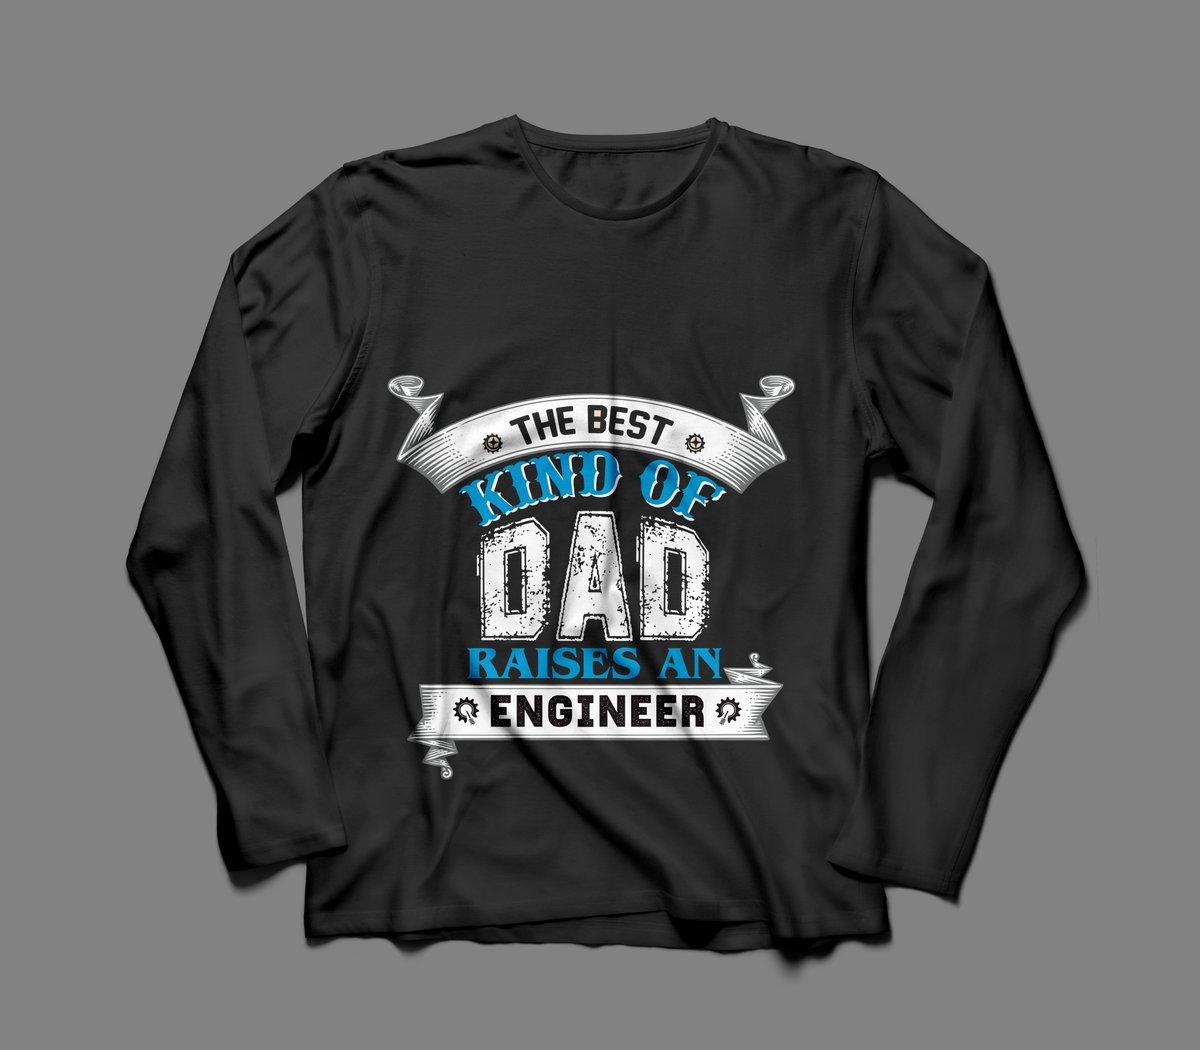 How is it? New T-Shirt Design #tshirt #tshirtdesign #engineertshirt #tshirtdesign https://t.co/IaLeVIwkCl